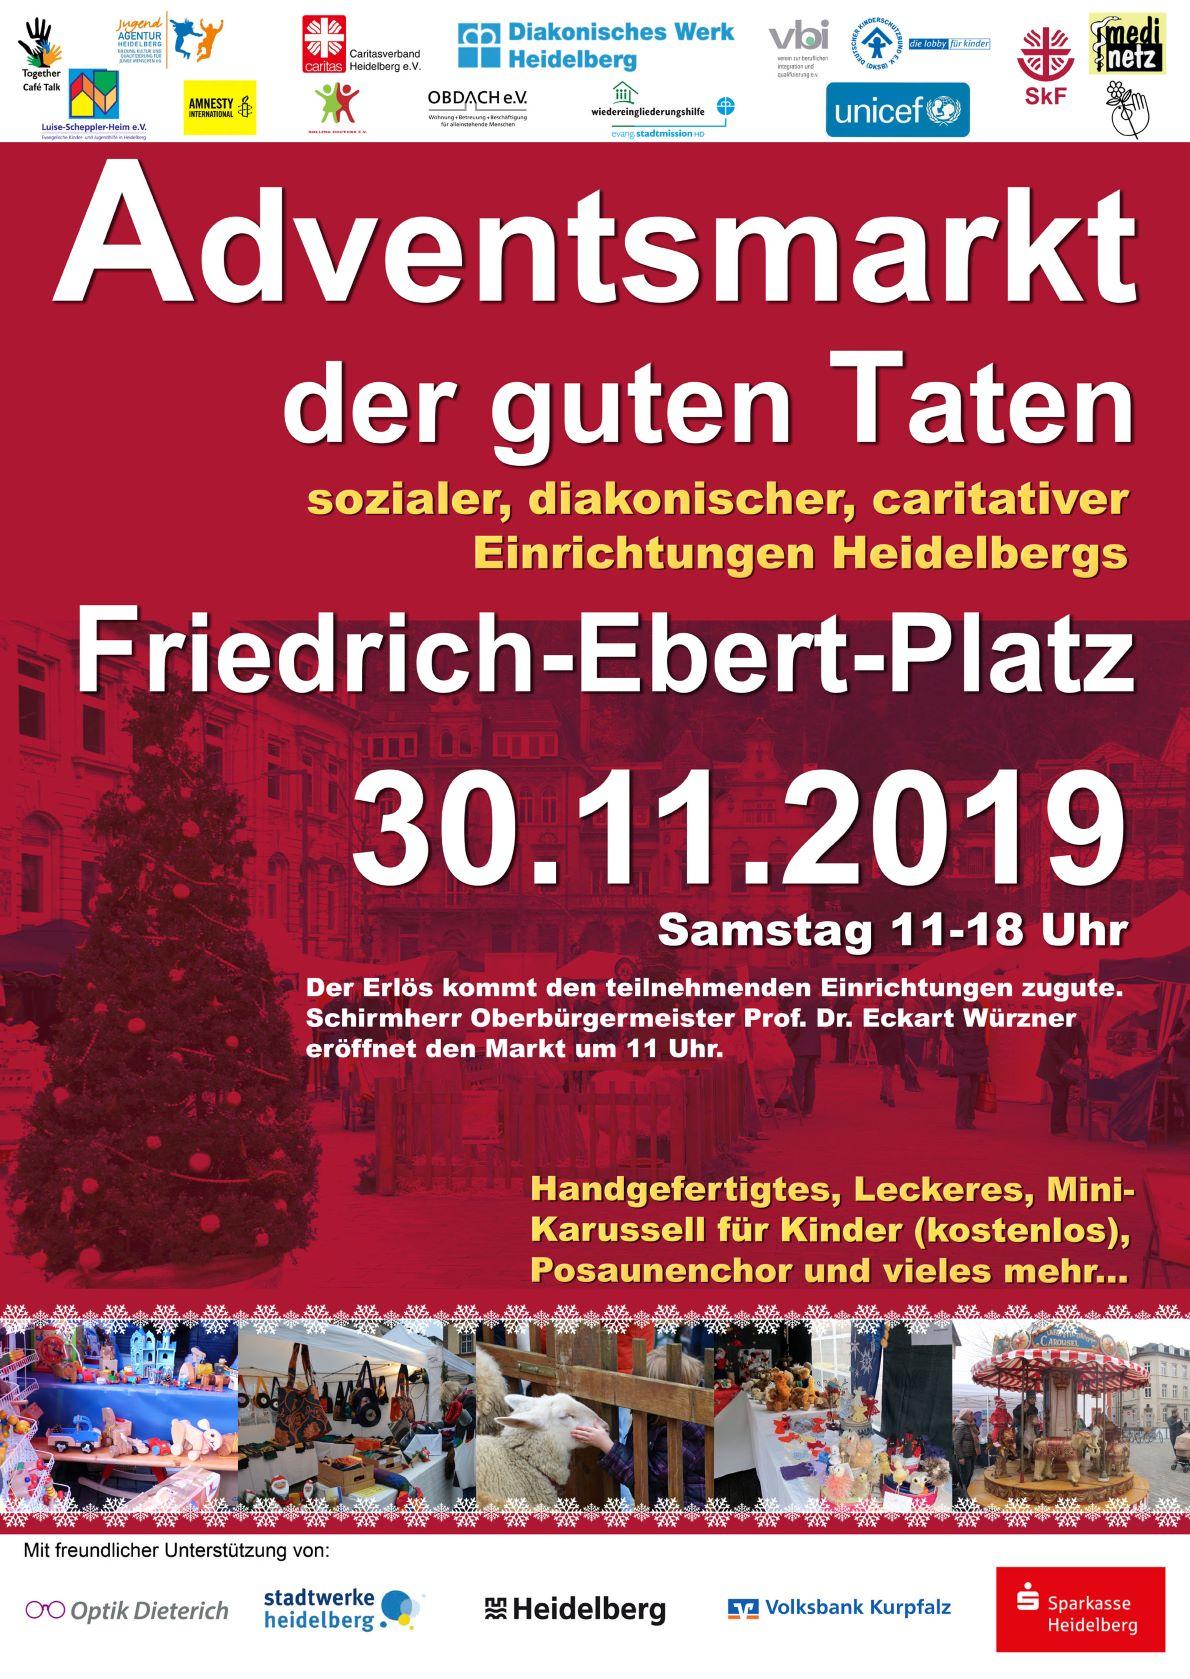 Adventsmarkrt der guten Taten am 30.11. 2019, Friedrich-Ebert-Platz in HD